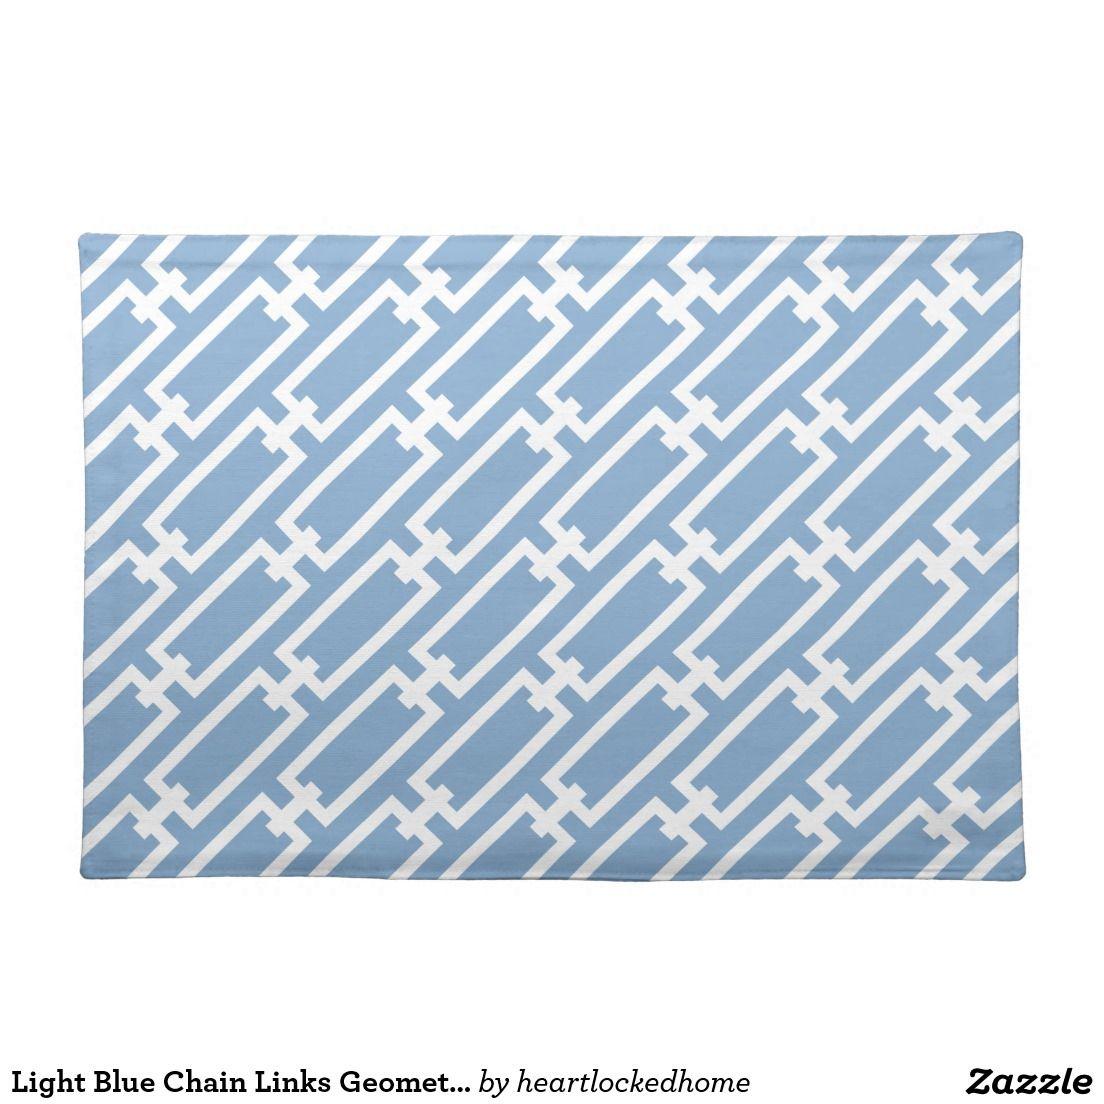 Light Blue Chain Links Geometric Pattern Cloth Placemat Geometric Pattern Clothing Patterns Geometric